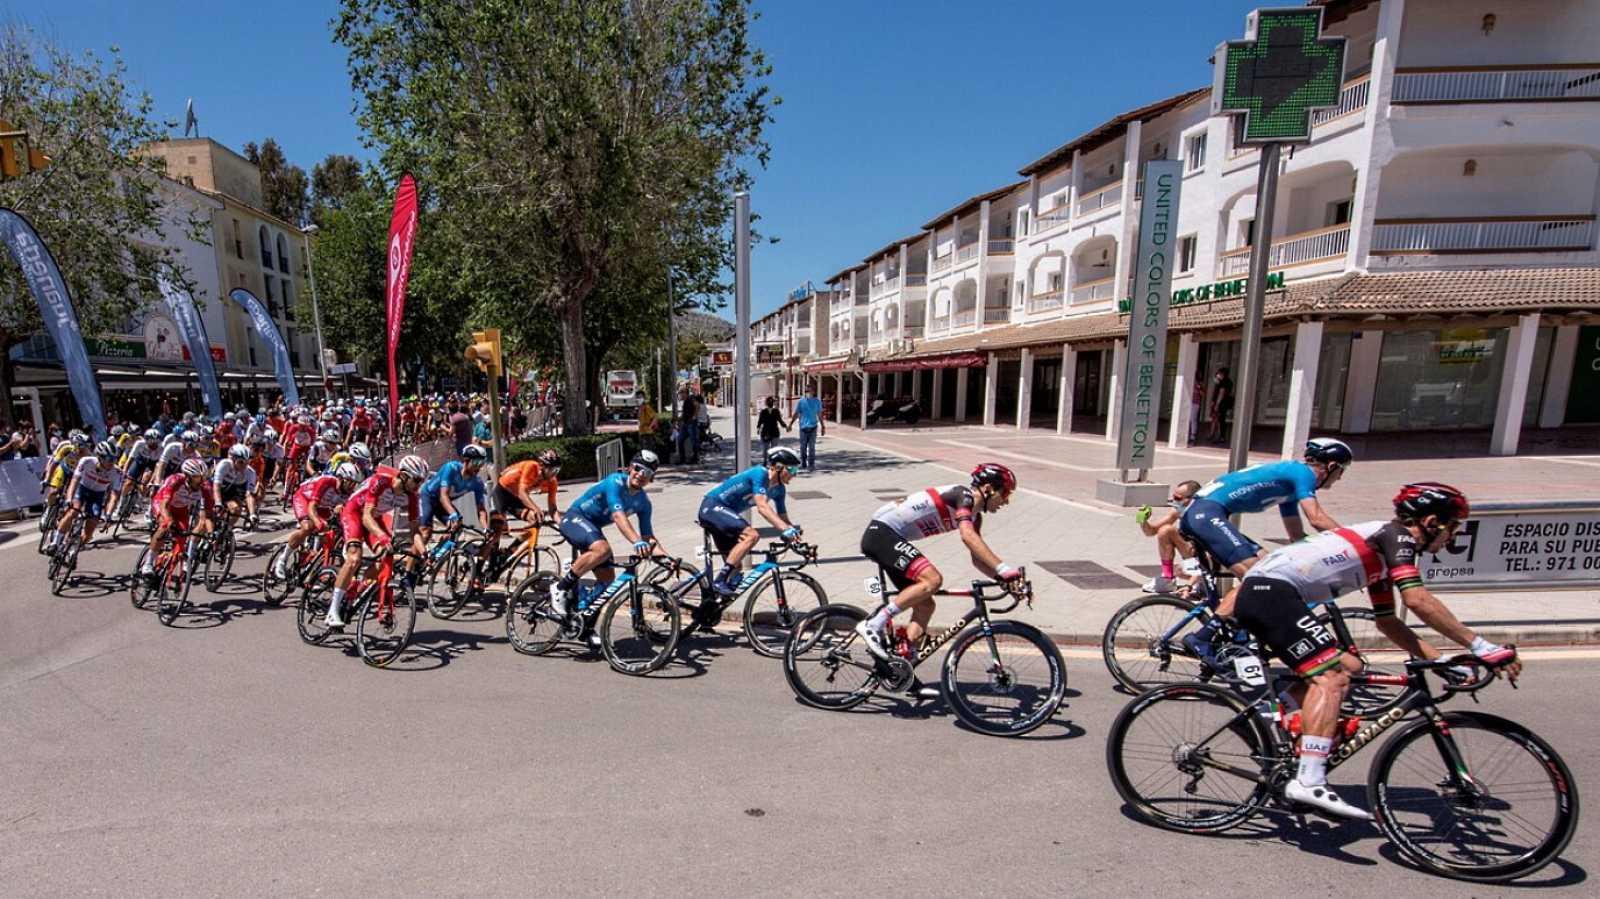 Ciclismo - Challenge ciclista Mallorca 4ª jornada Trofeo Alcudia-Port D'Alcudia - ver ahora